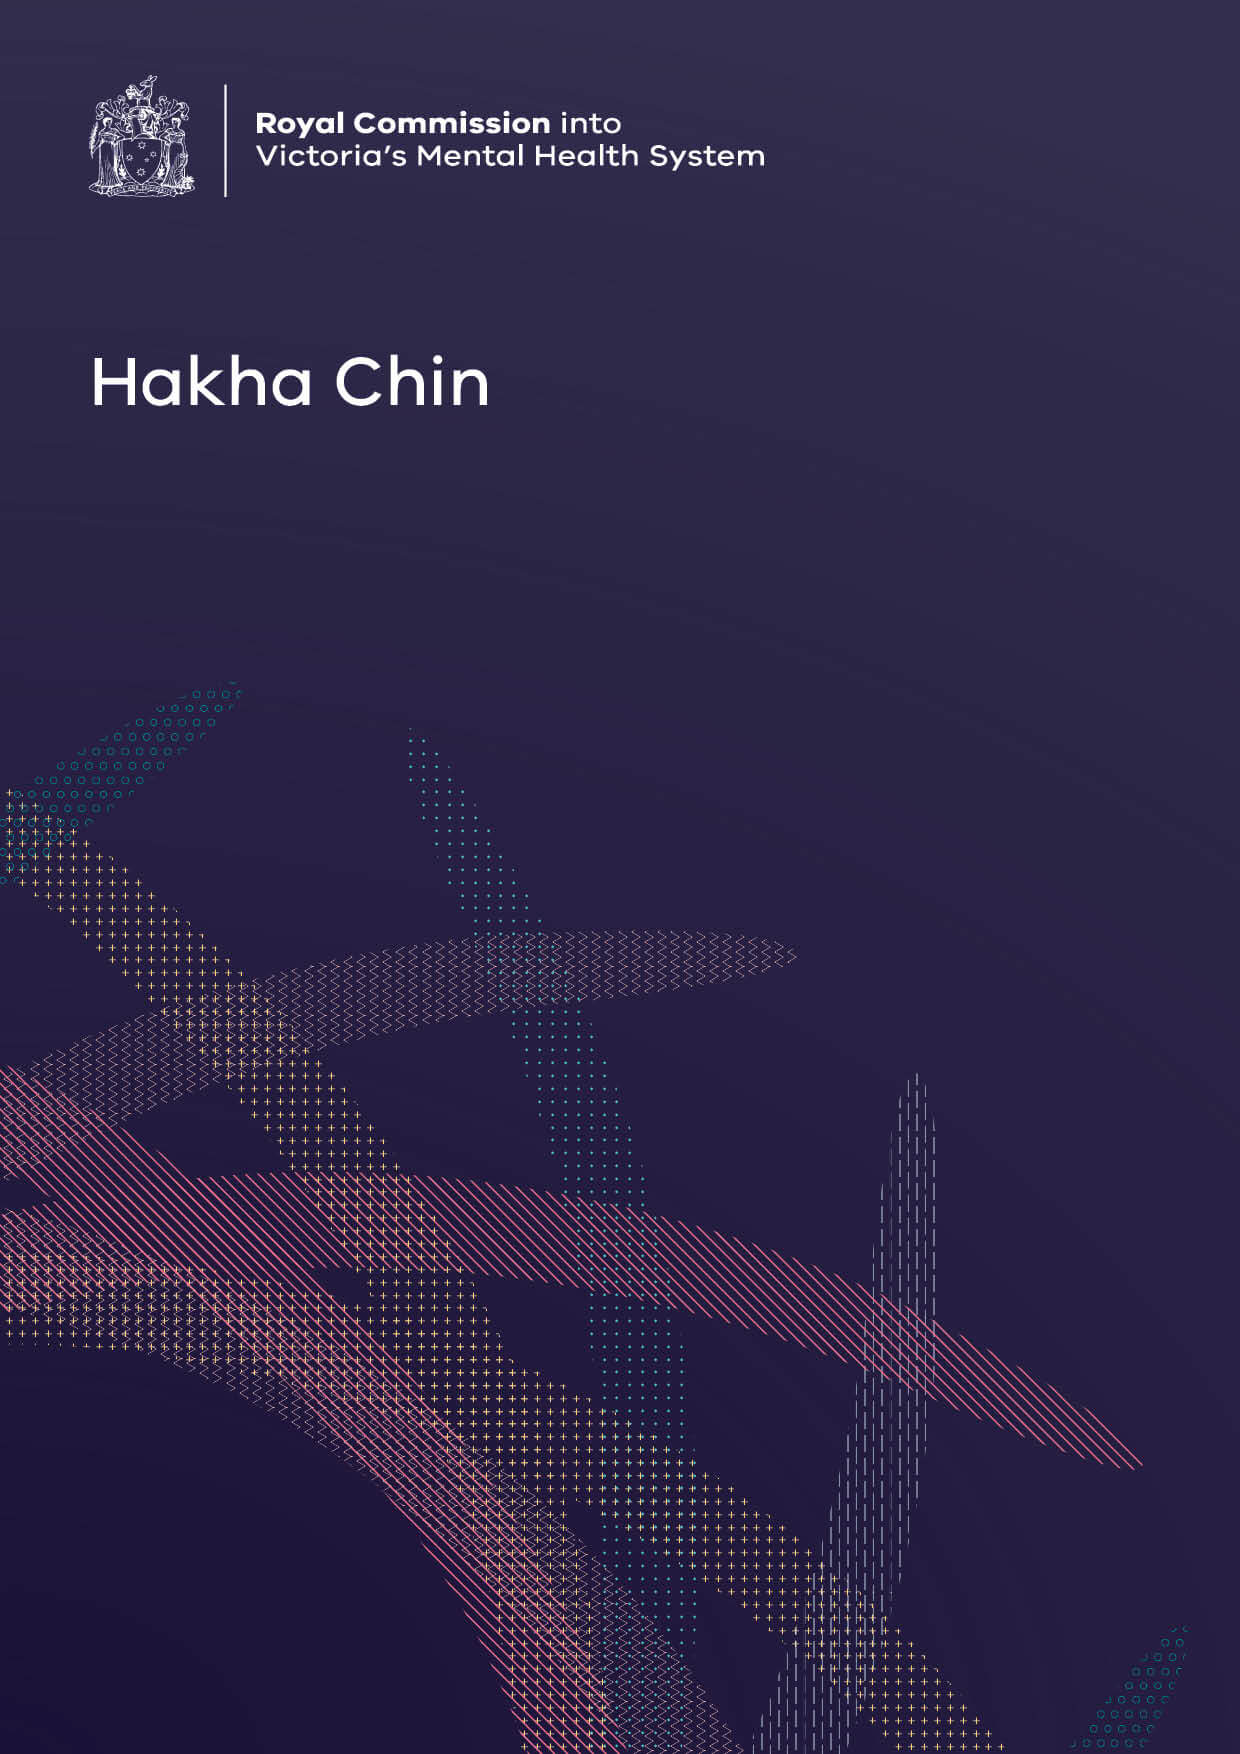 RCVMHS_FinalReport_Covers_Hakha-Chin